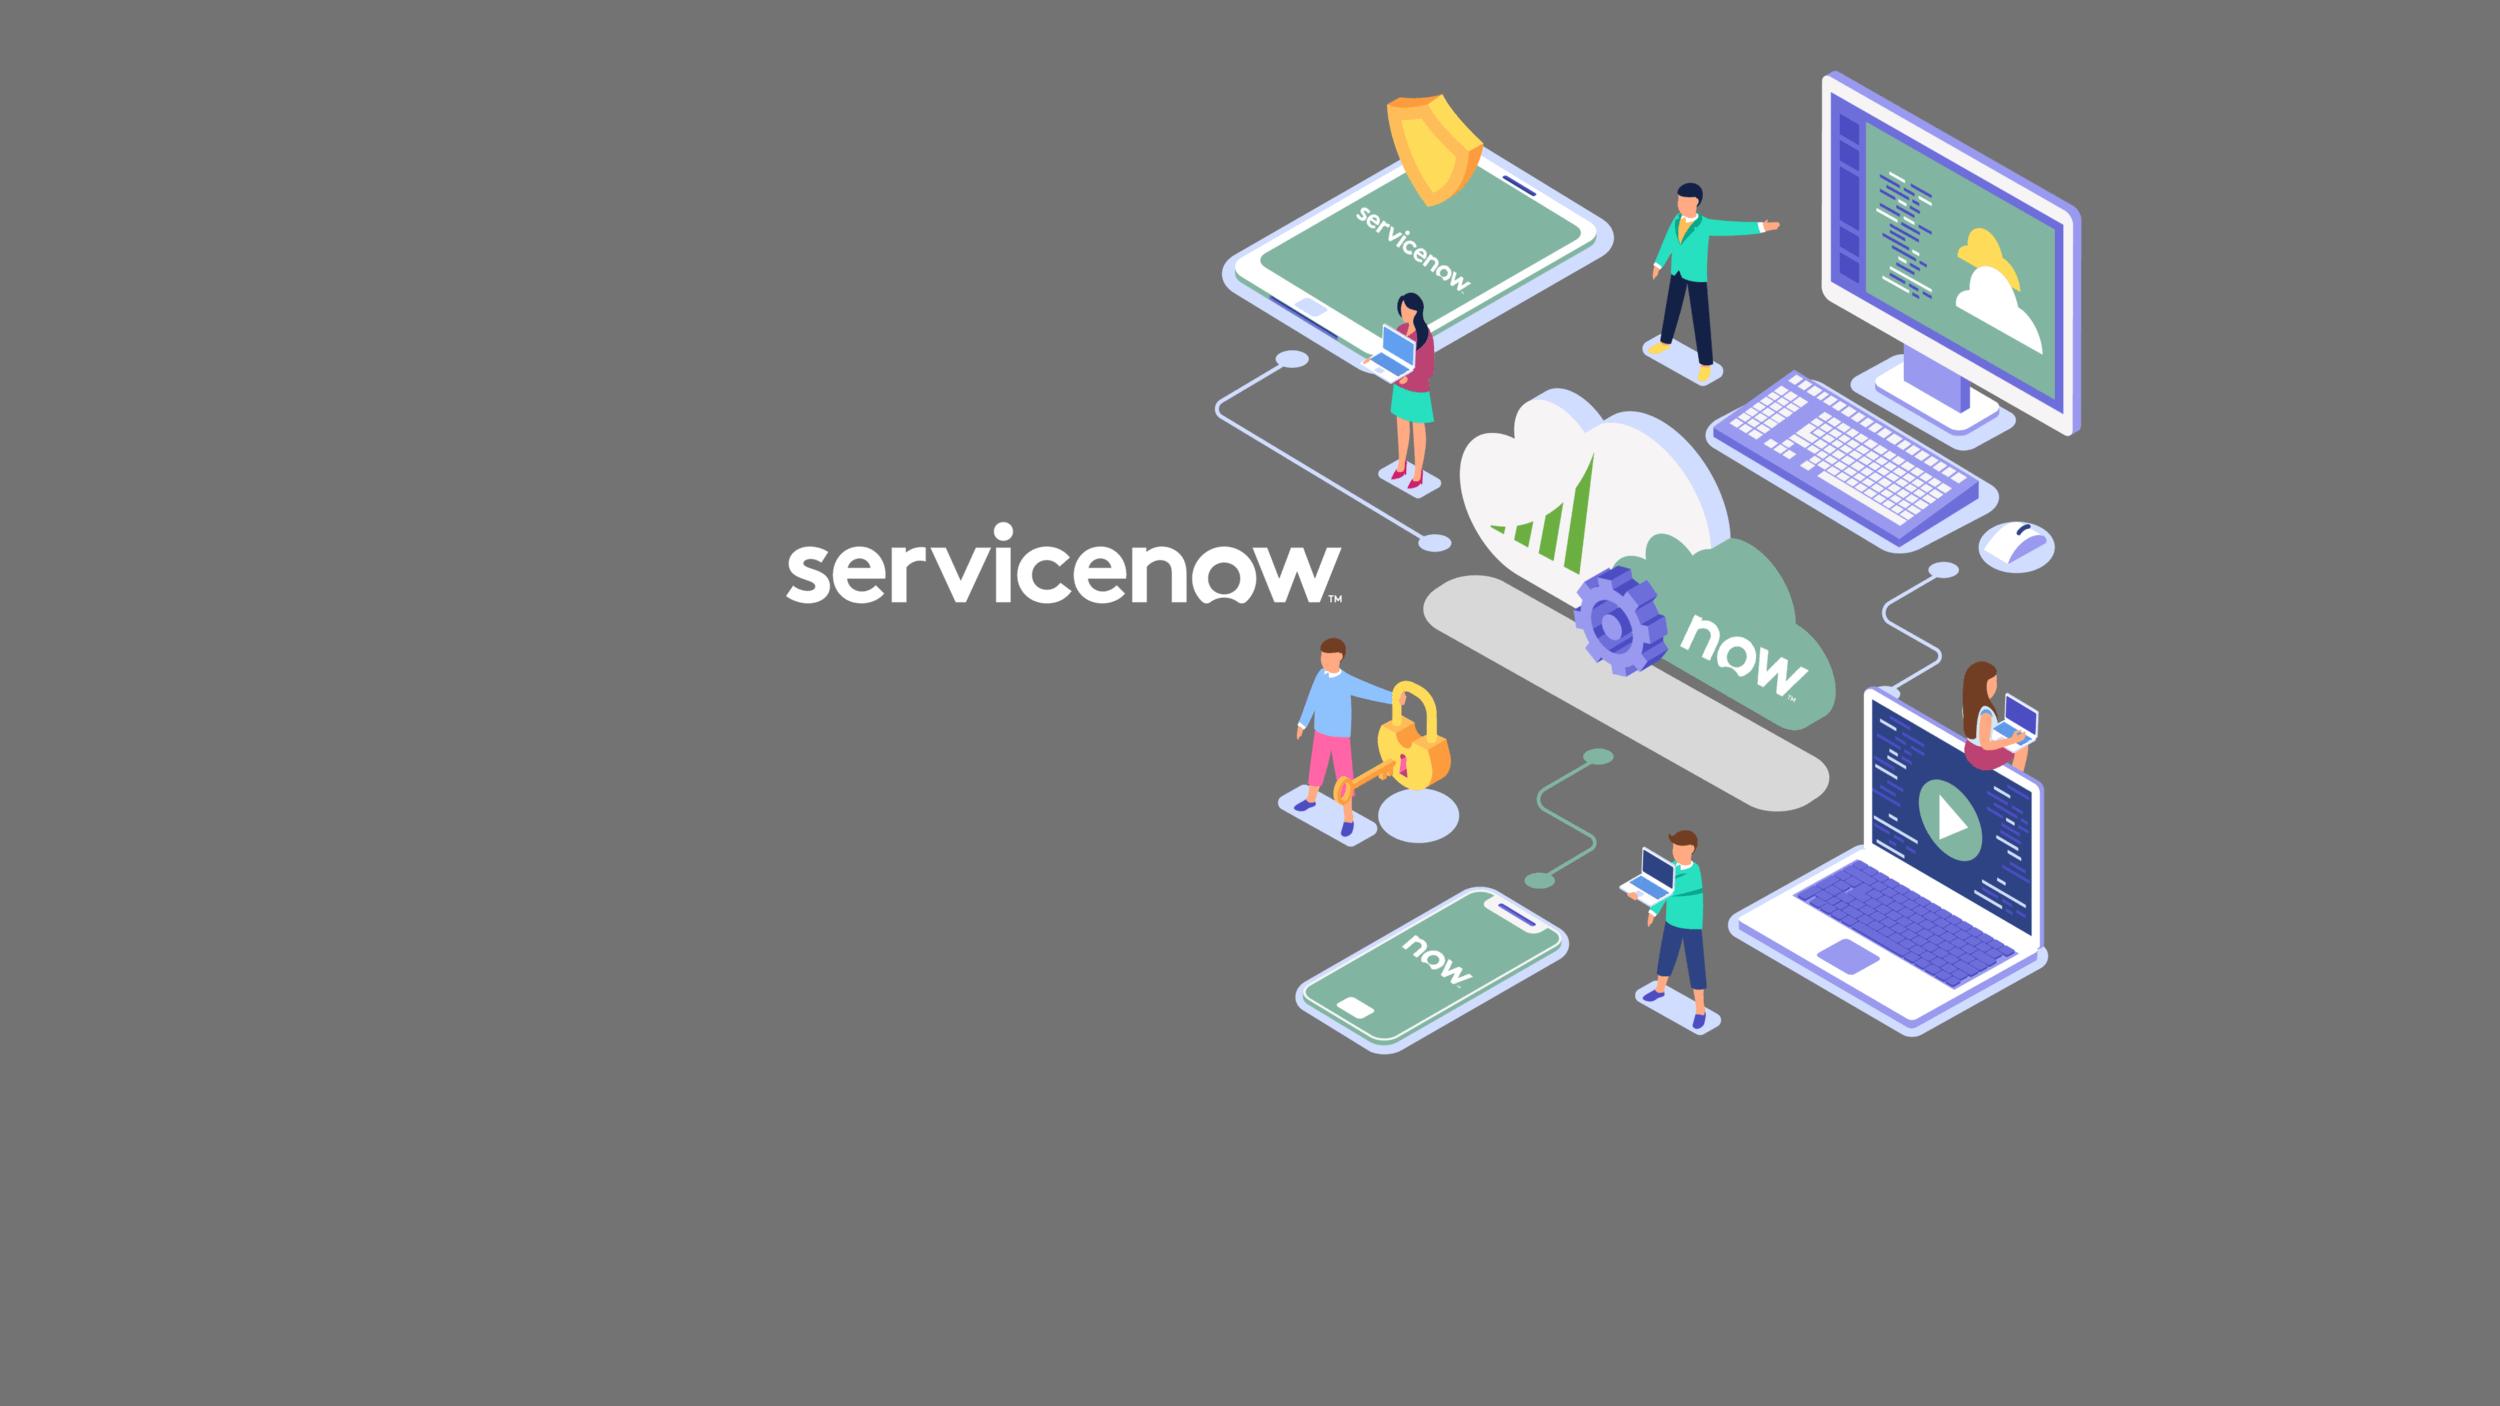 servicenow-custom-apps